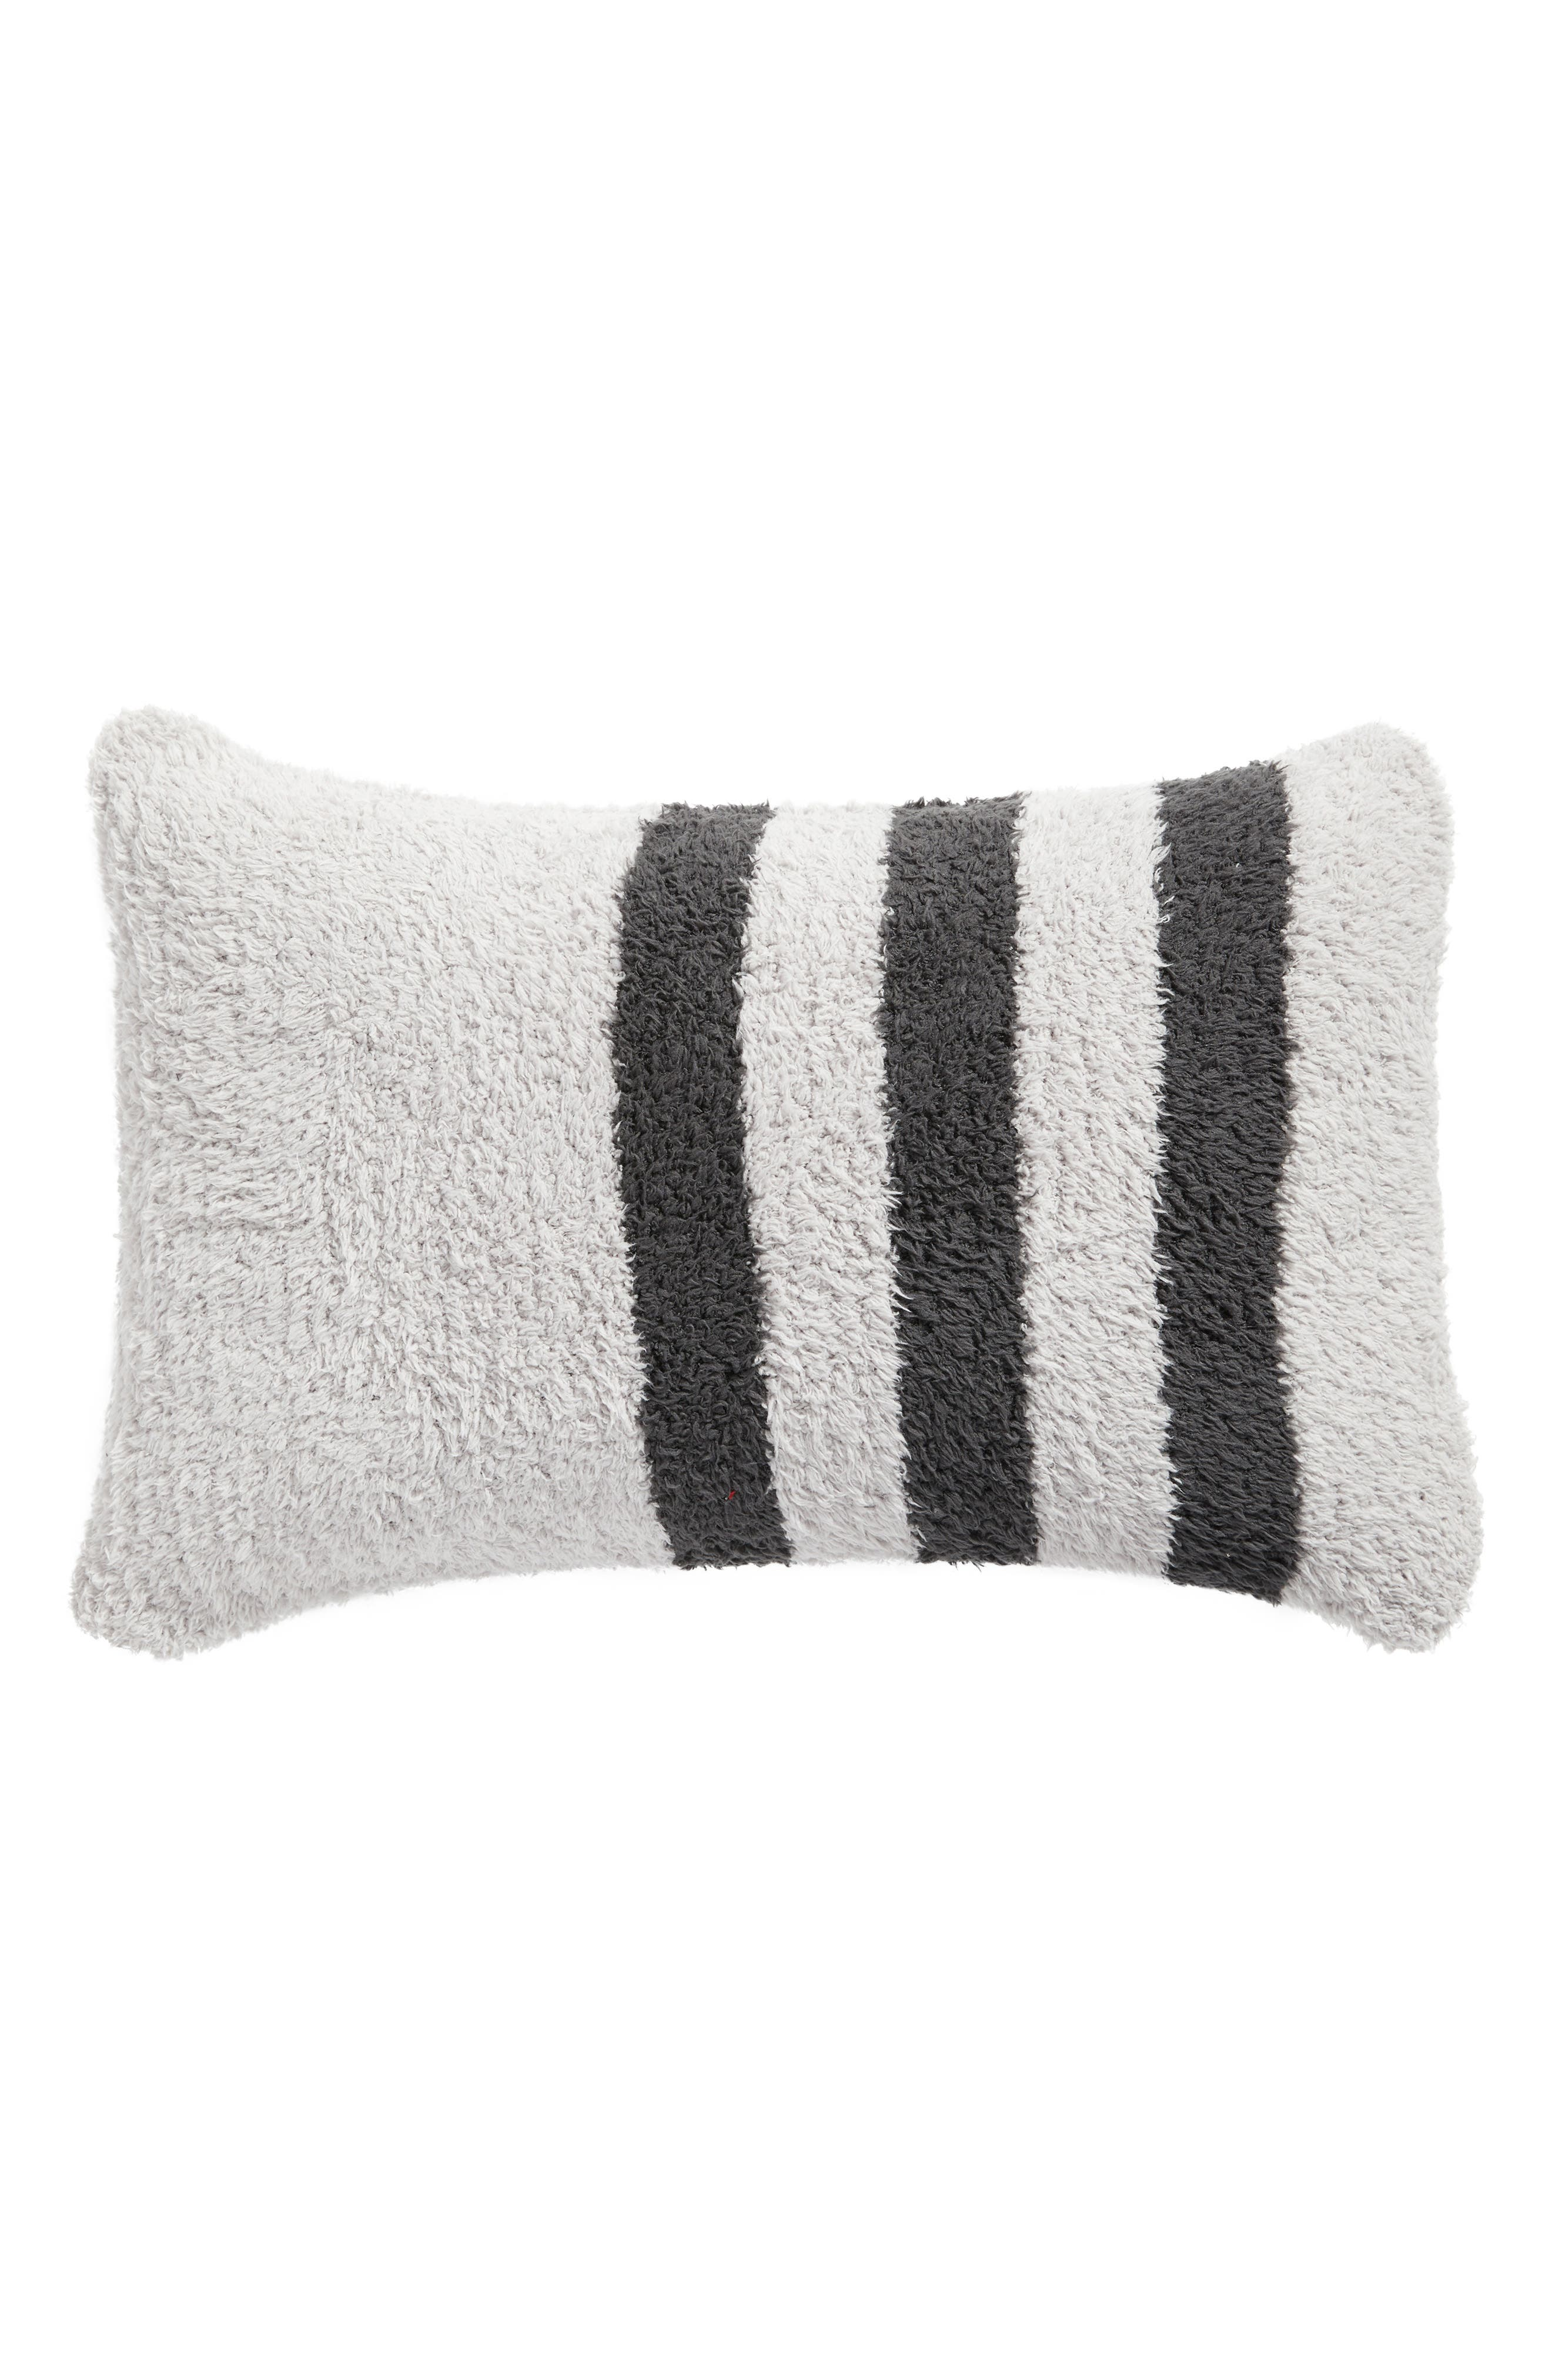 Main Image - Barefoot Dreams® Cozychic® Tri-Stripe Accent Pillow